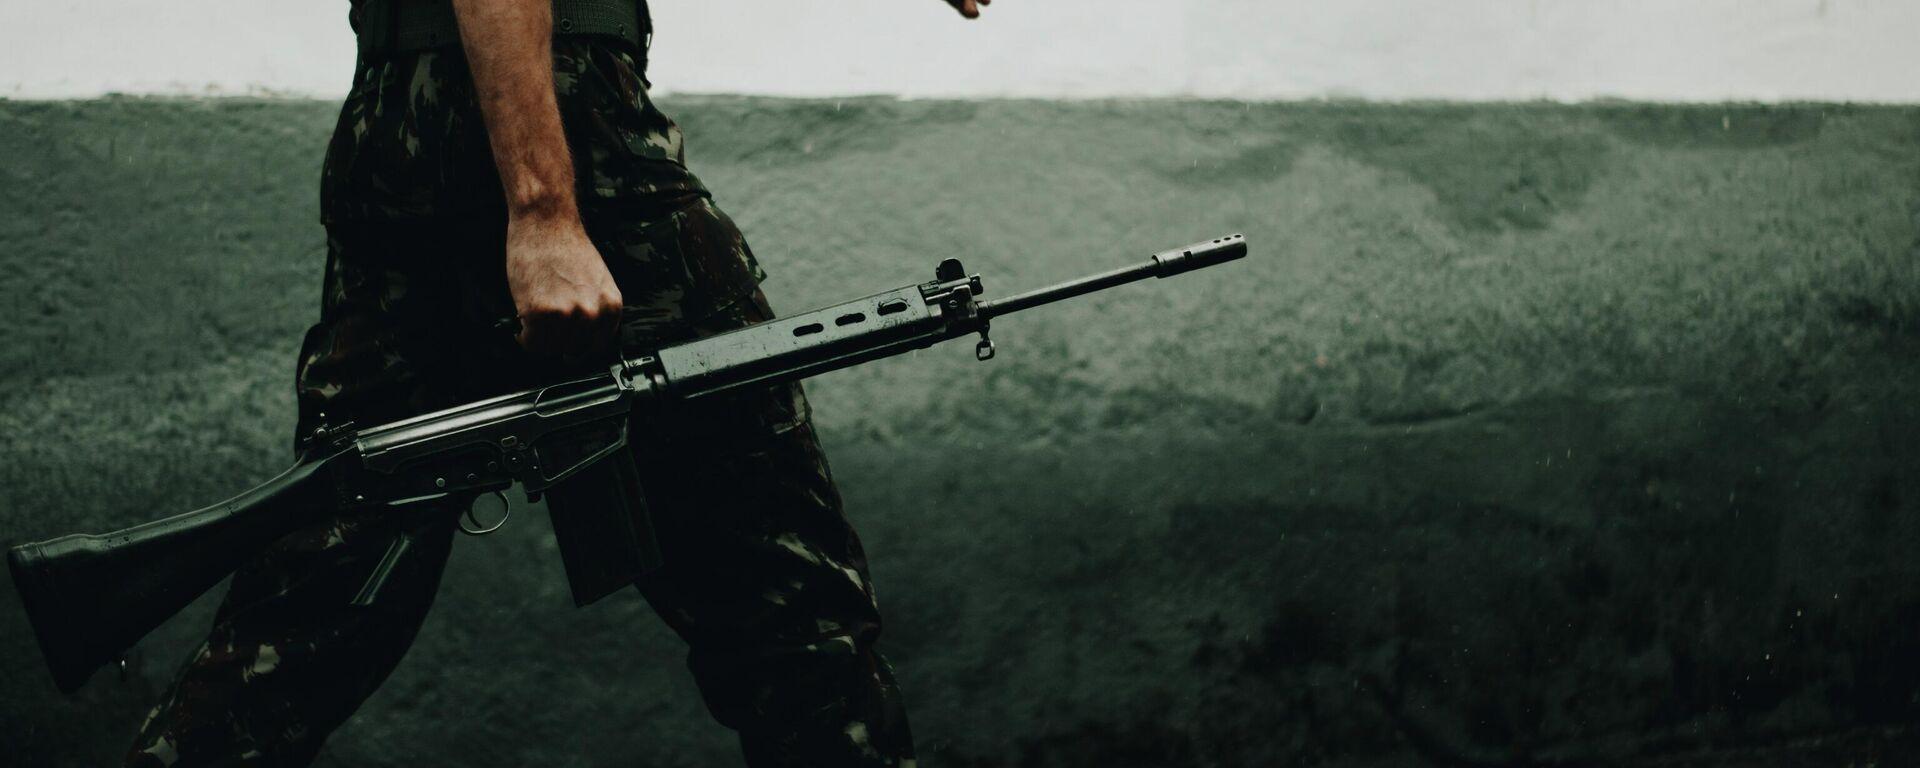 Un soldado sosteniendo un rifle - Sputnik Mundo, 1920, 28.09.2021